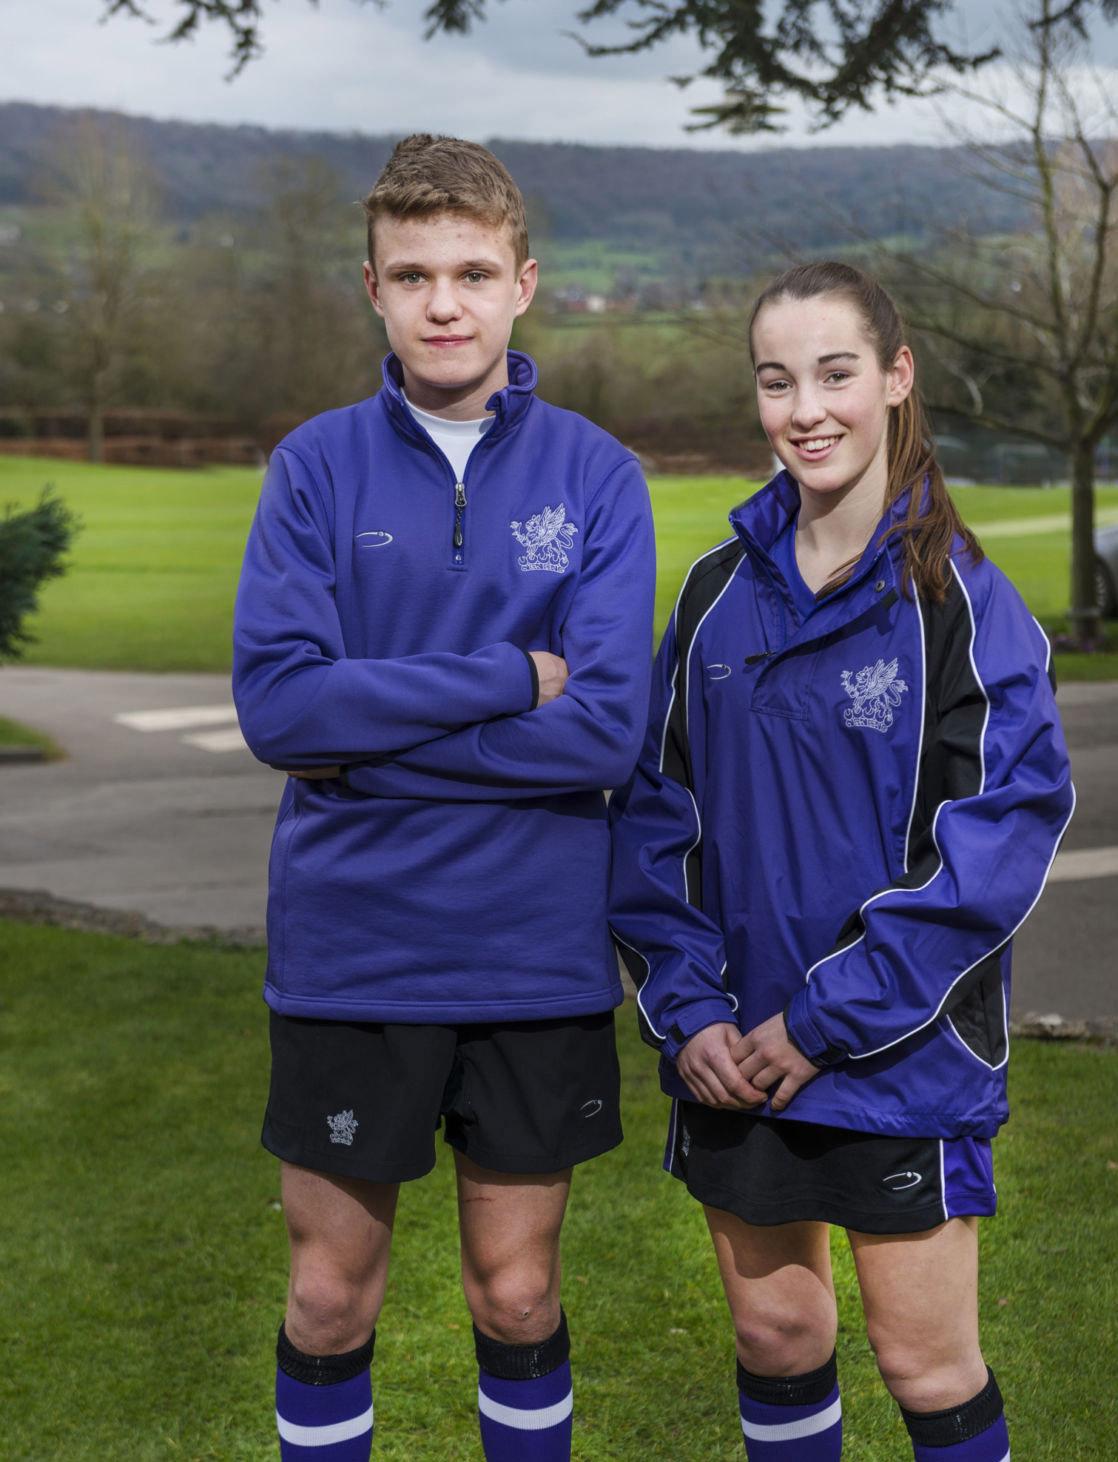 wycliffe pupils wearing the sports uniform